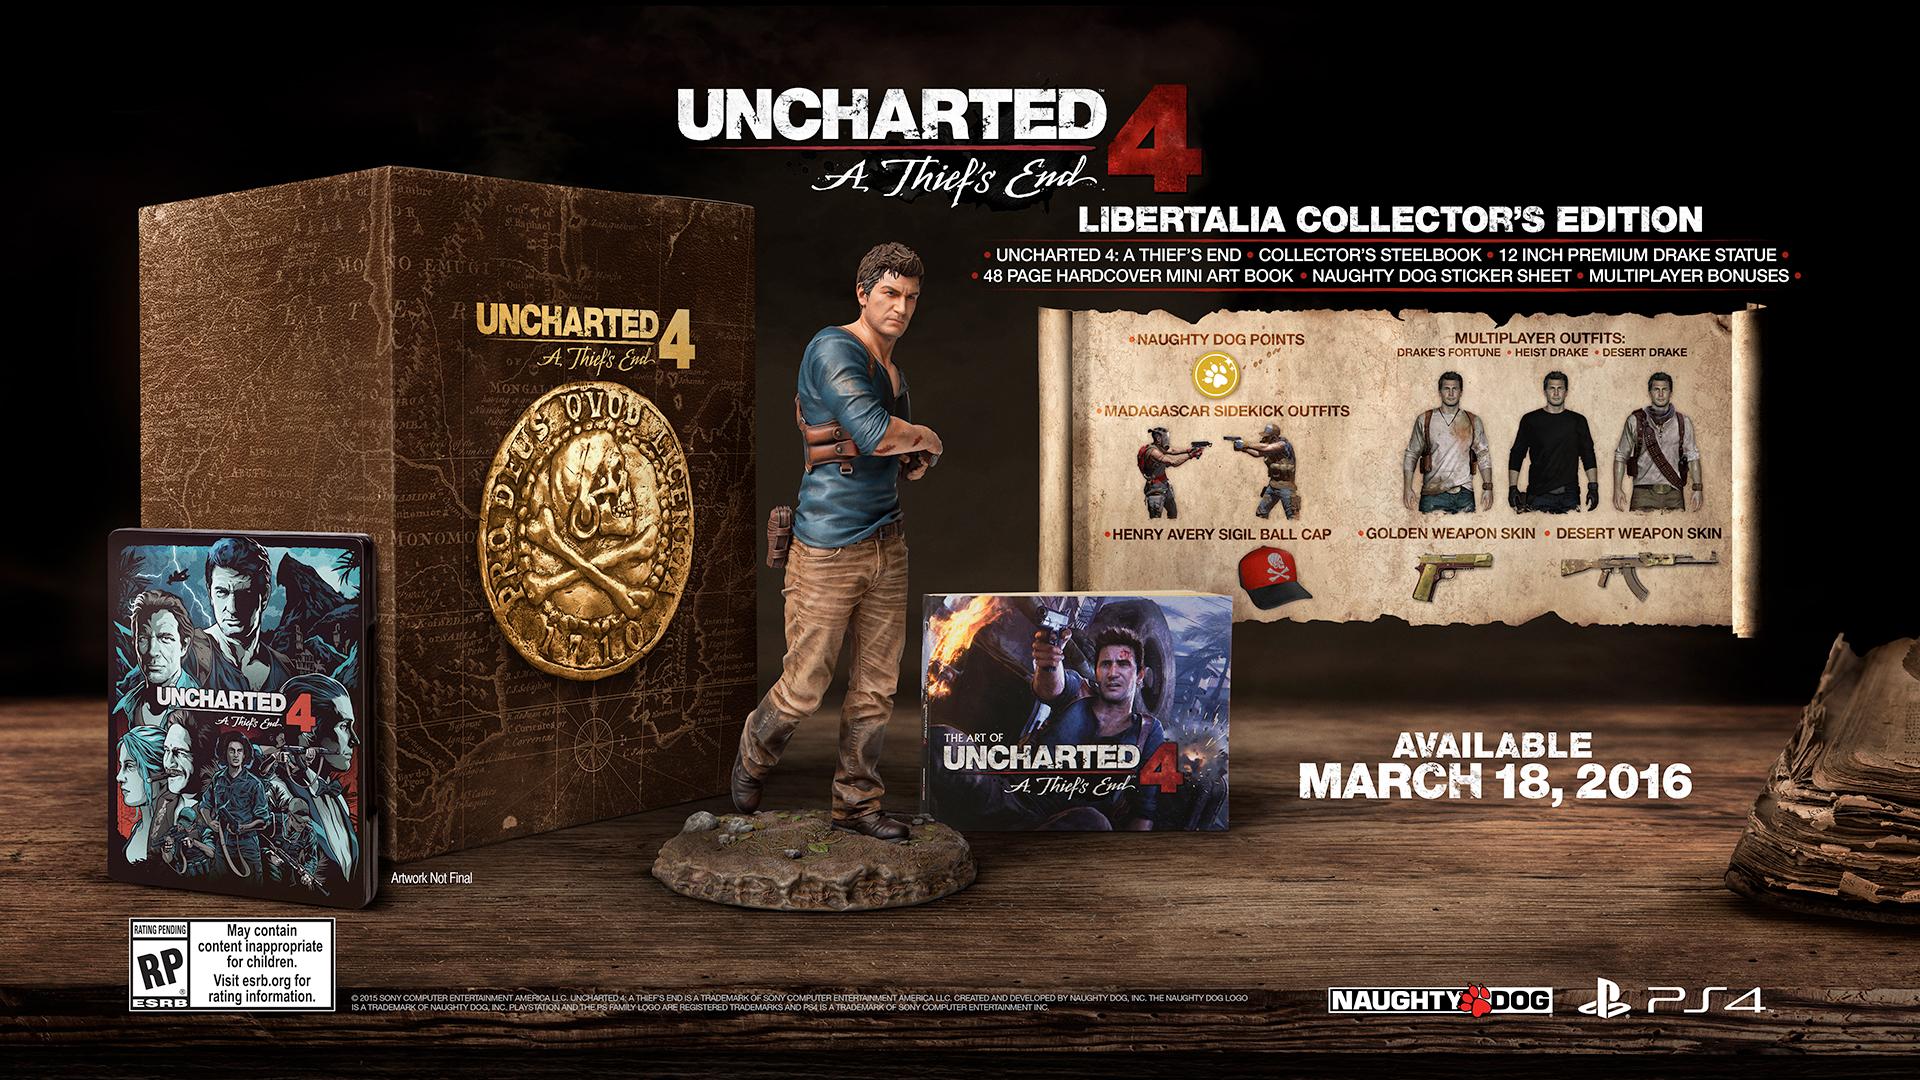 uncharted-4-a-thiefs-end-libertalia-collectors-edition